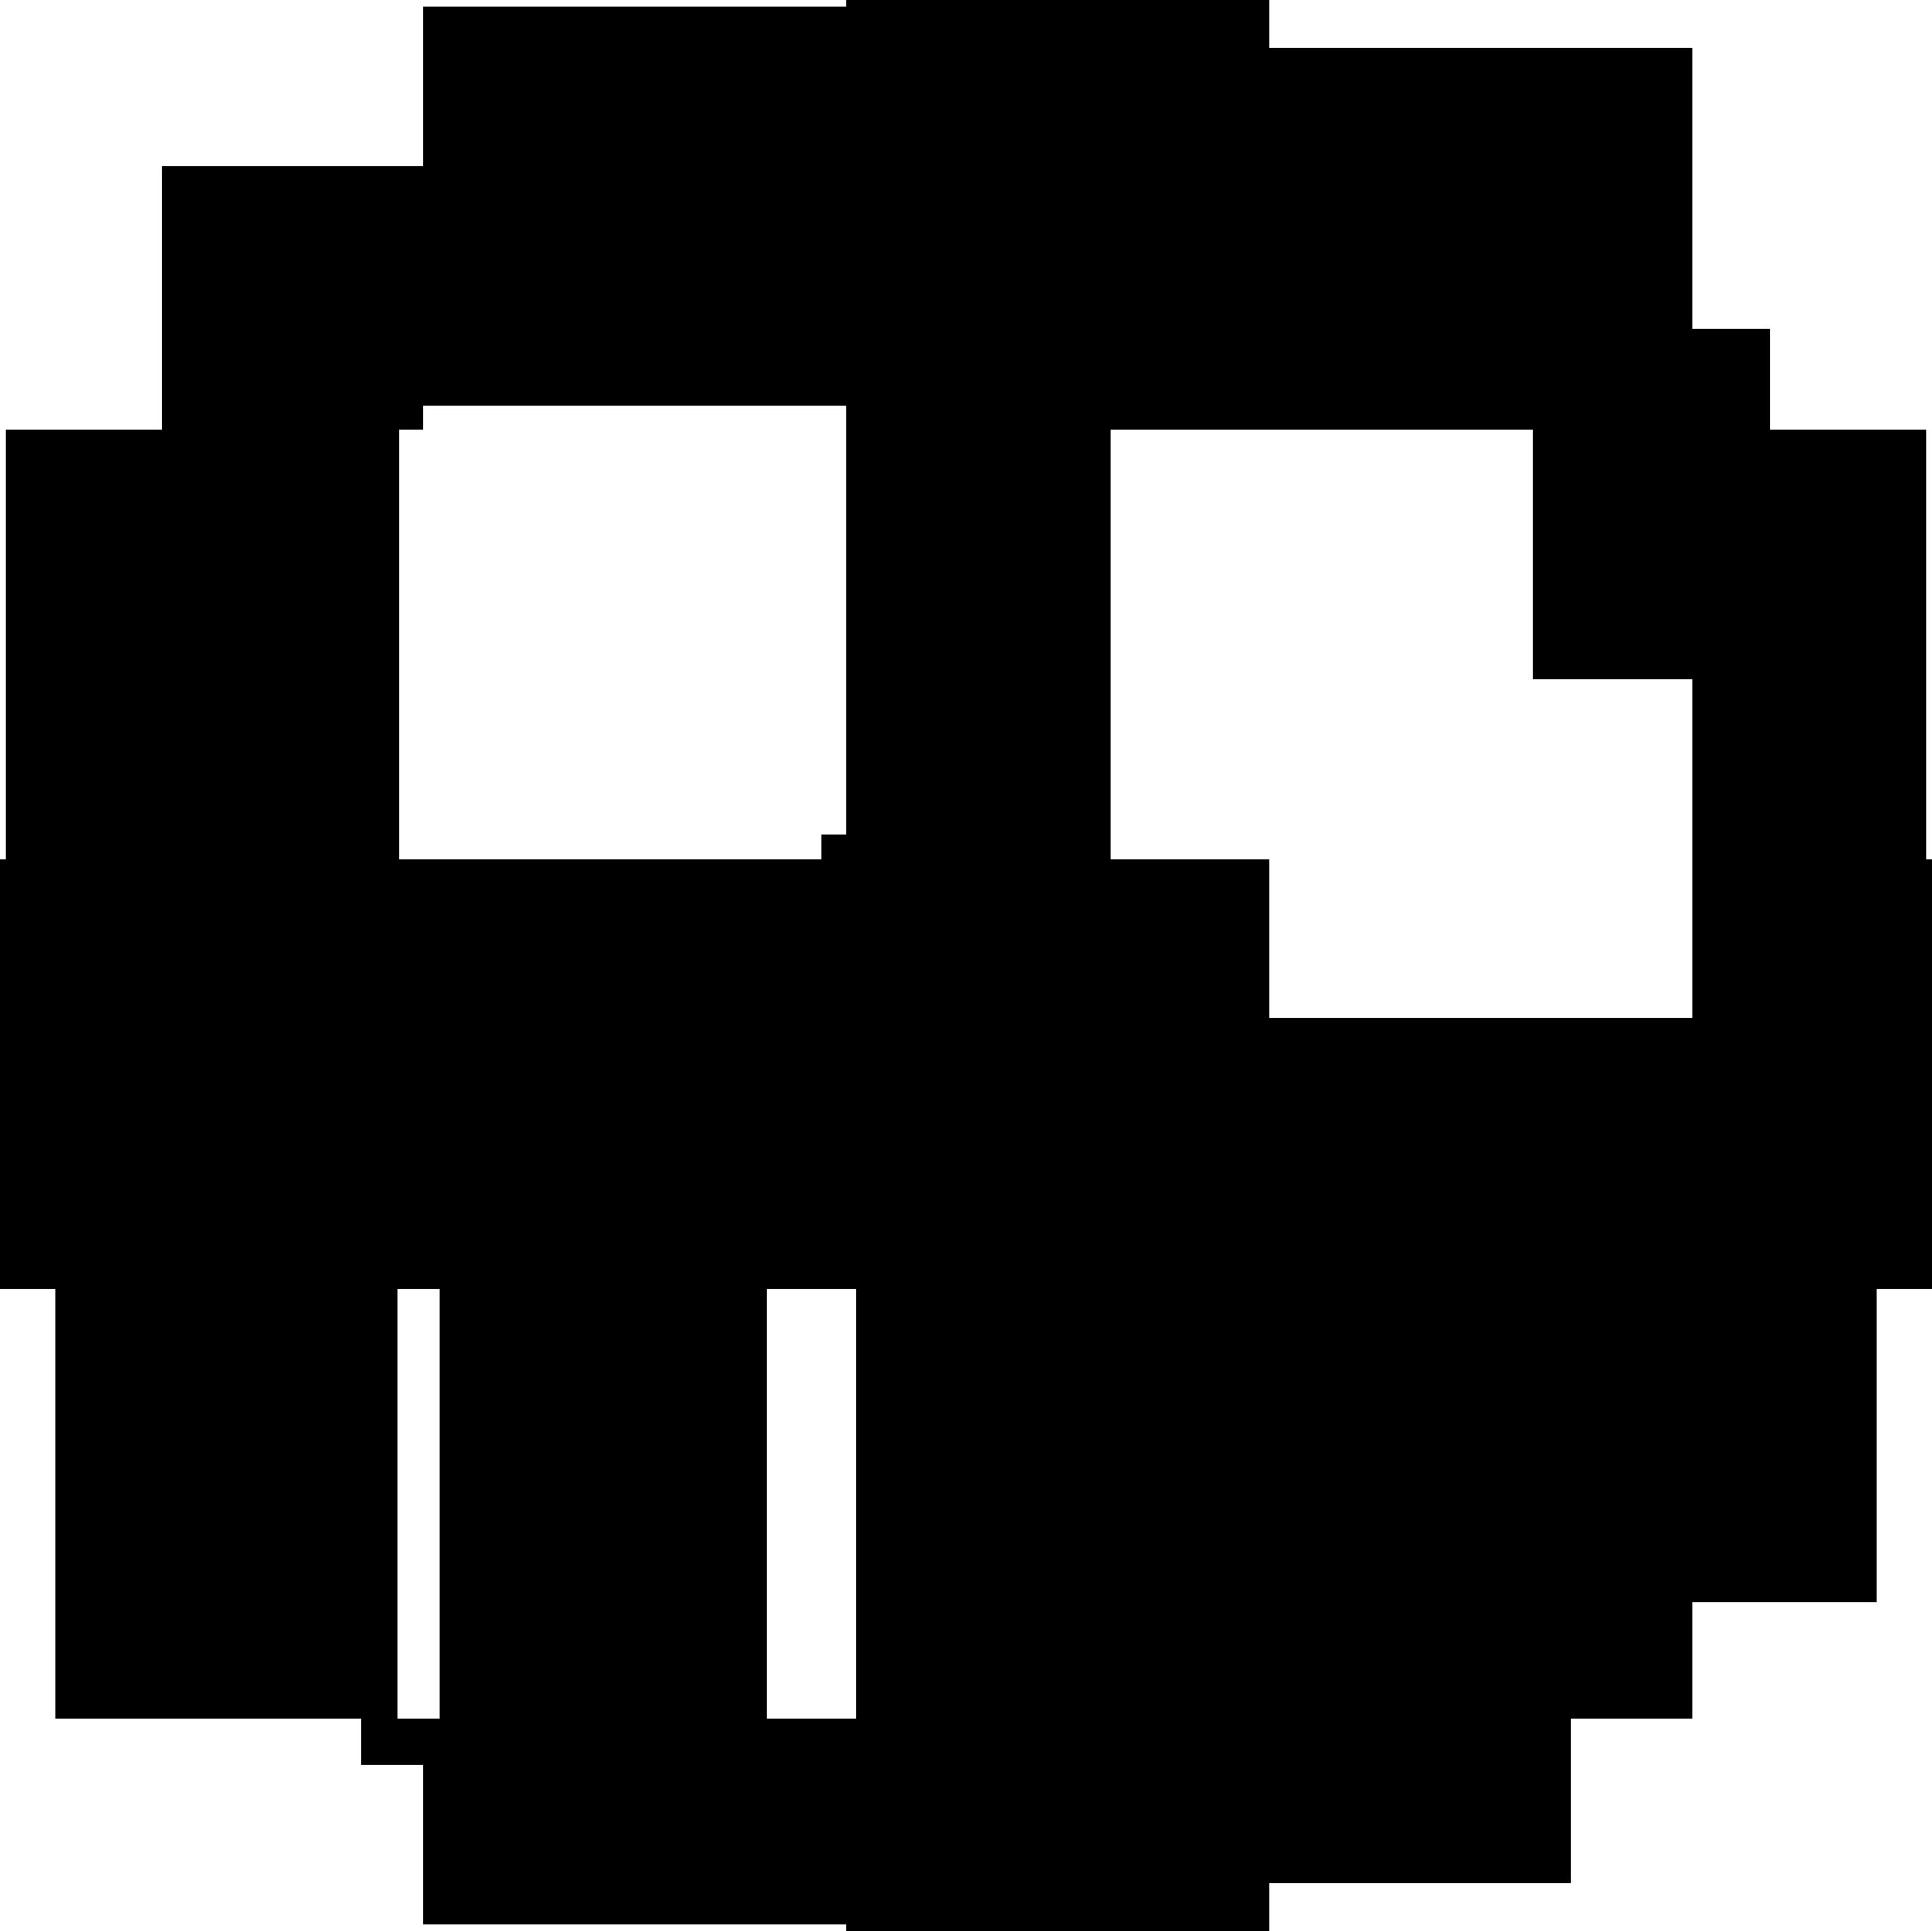 Peace clipart peace logo. Symbol png transparent hd